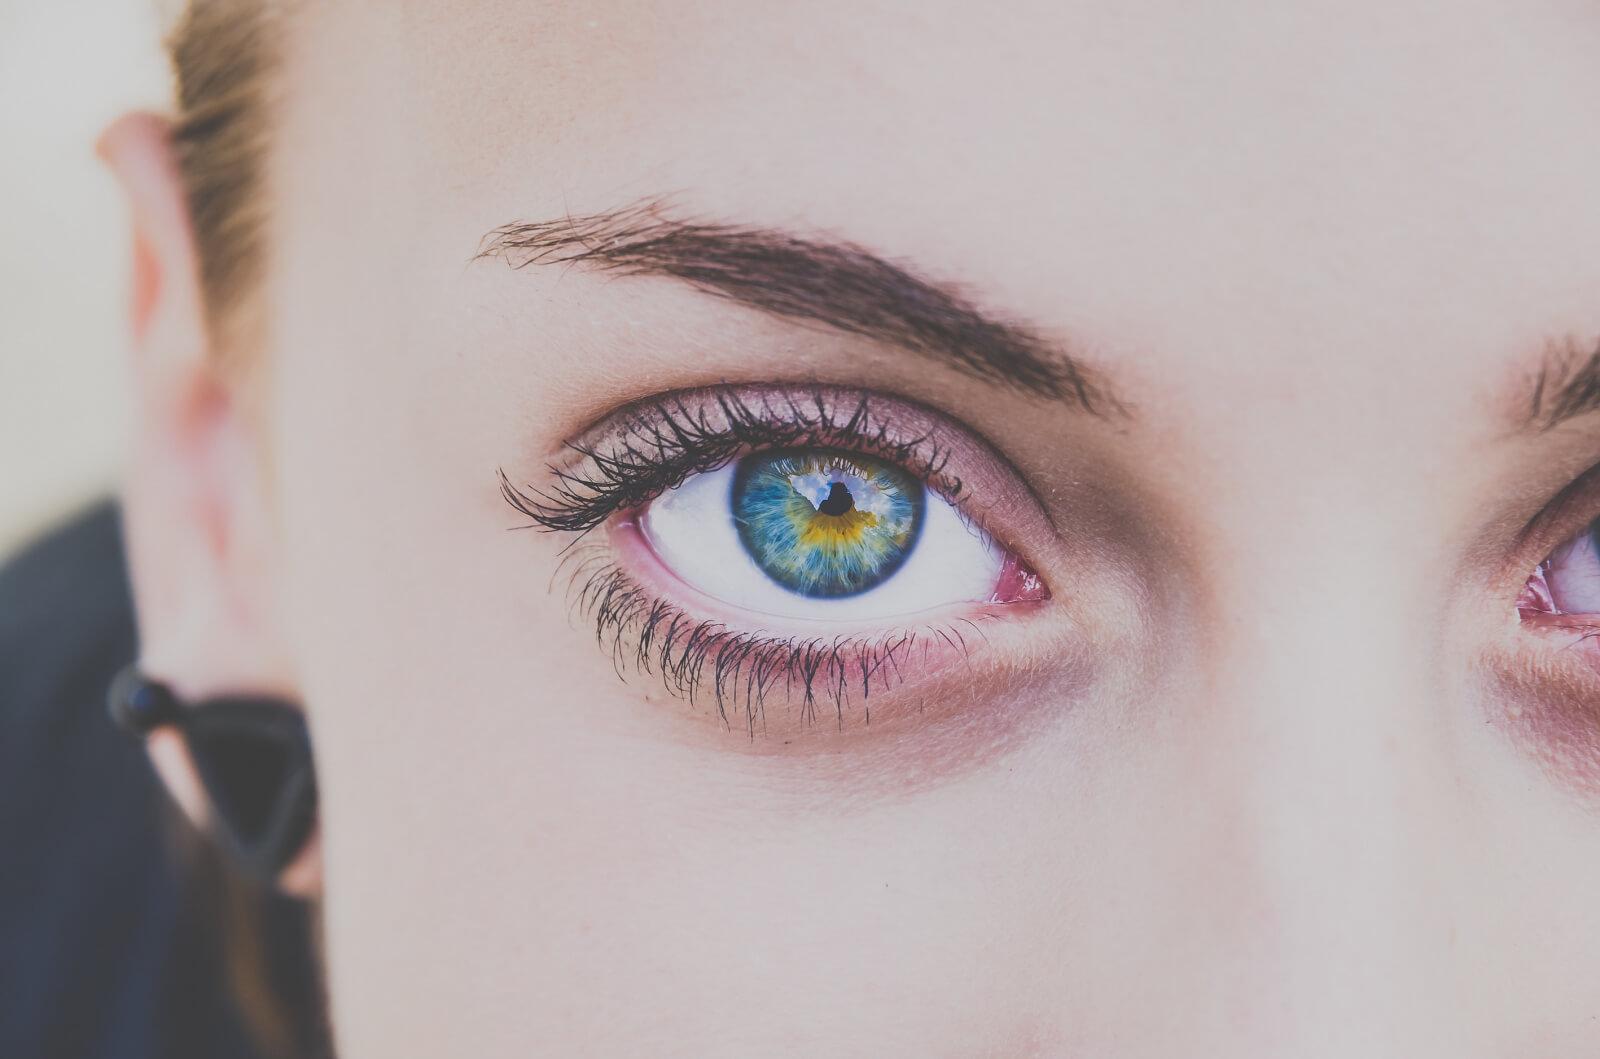 Dr.-Hauschka-Volume-Mascara-01-Black-10ml-abloomnova.net_-1600x1059 The hardest working eye cream in the business